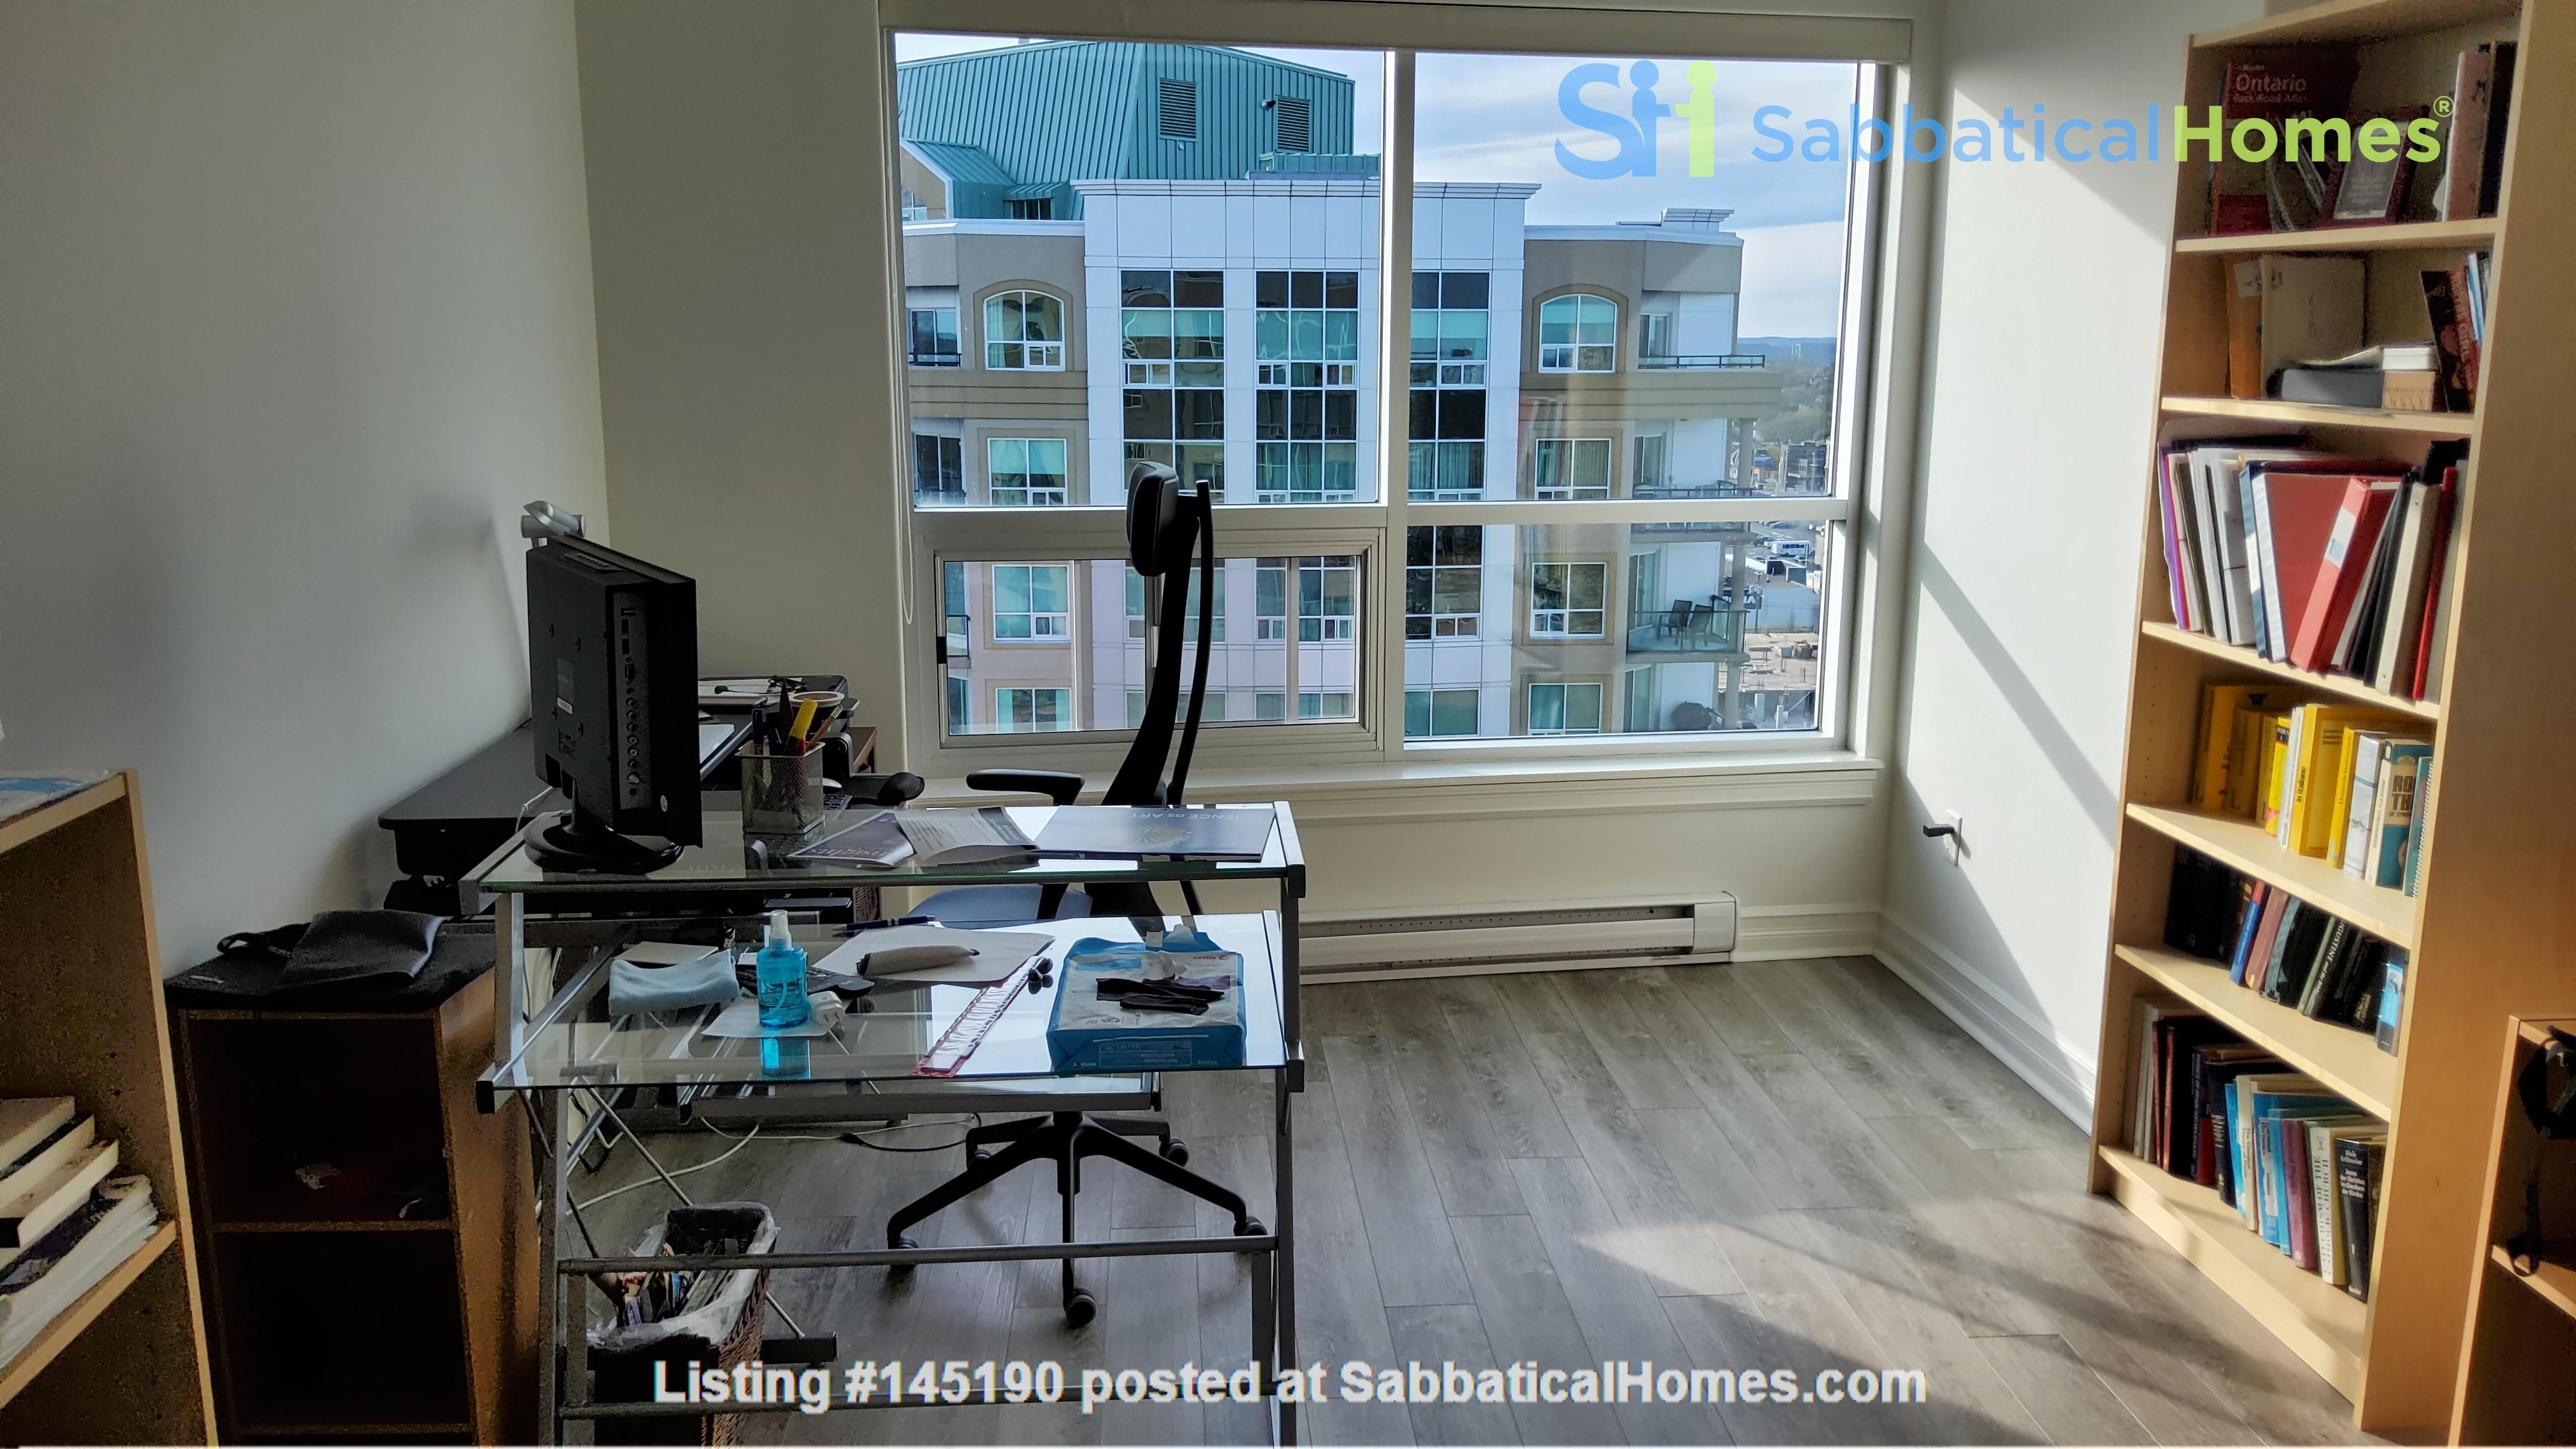 Spacious, Sunny, 12th-floor Condo in the North End of Halifax, Nova Scotia Home Rental in Halifax, Nova Scotia, Canada 1